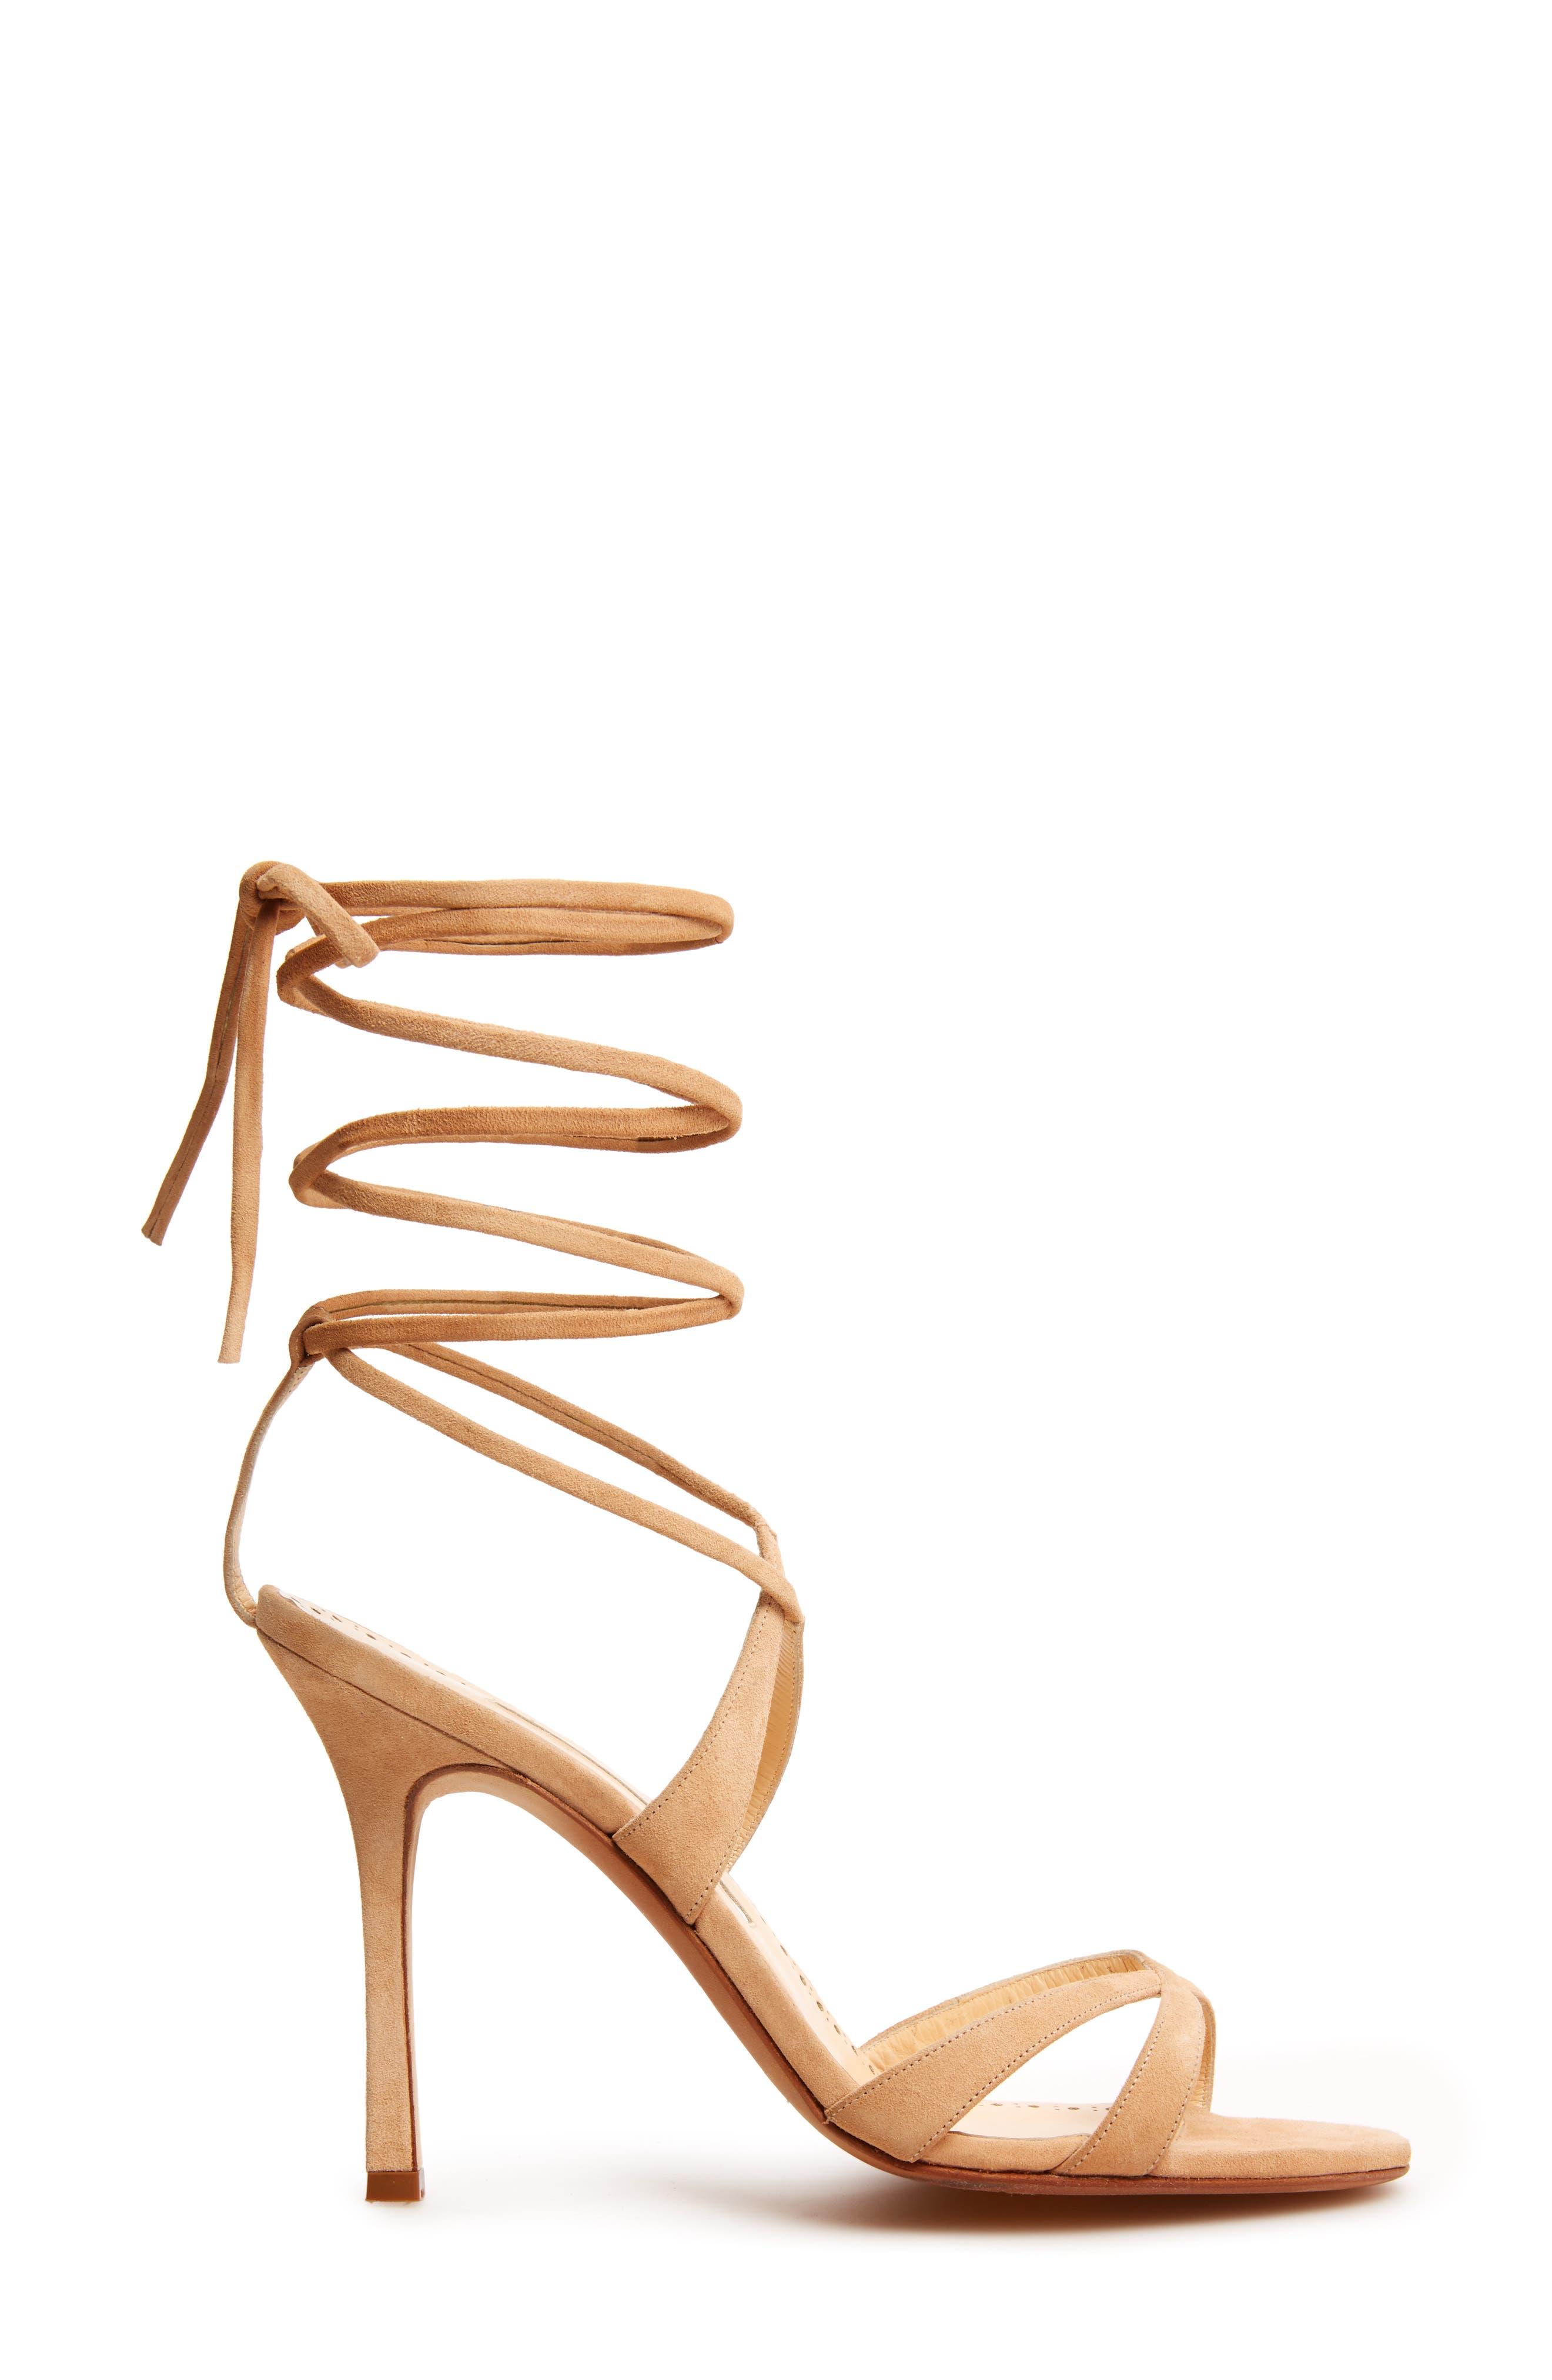 Criss Ankle Tie Sandal,                             Alternate thumbnail 3, color,                             Light Camel